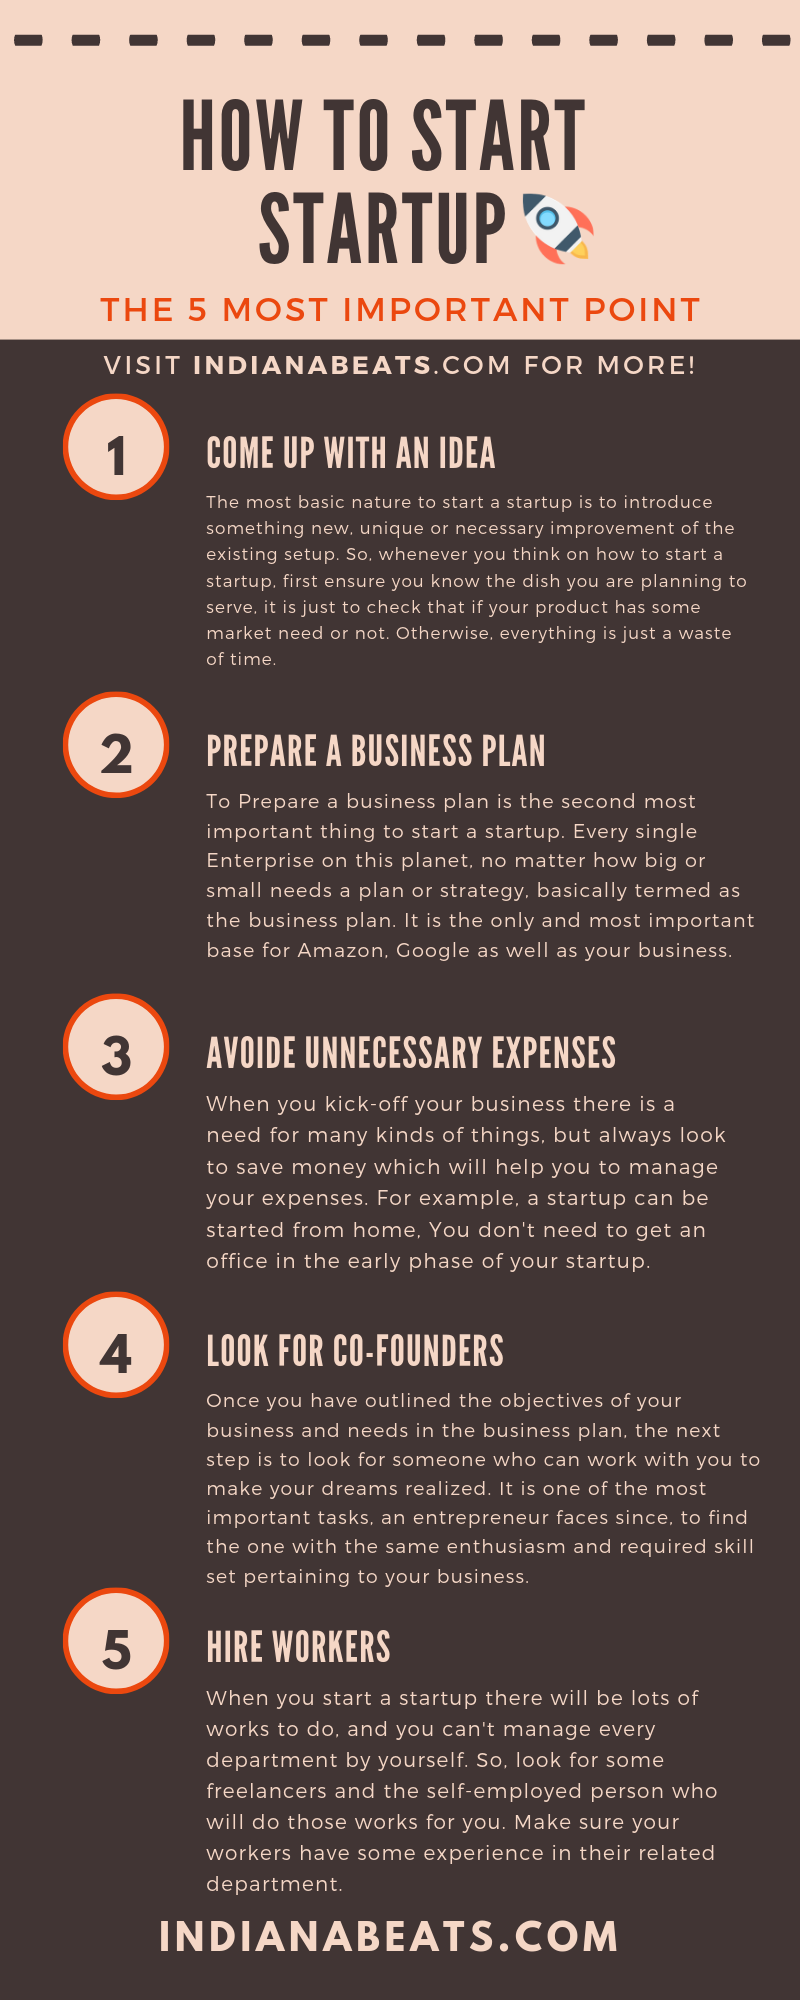 how to start startup, how to start startup in india, how to start startup business, how to start startup business in india, how to start your startup